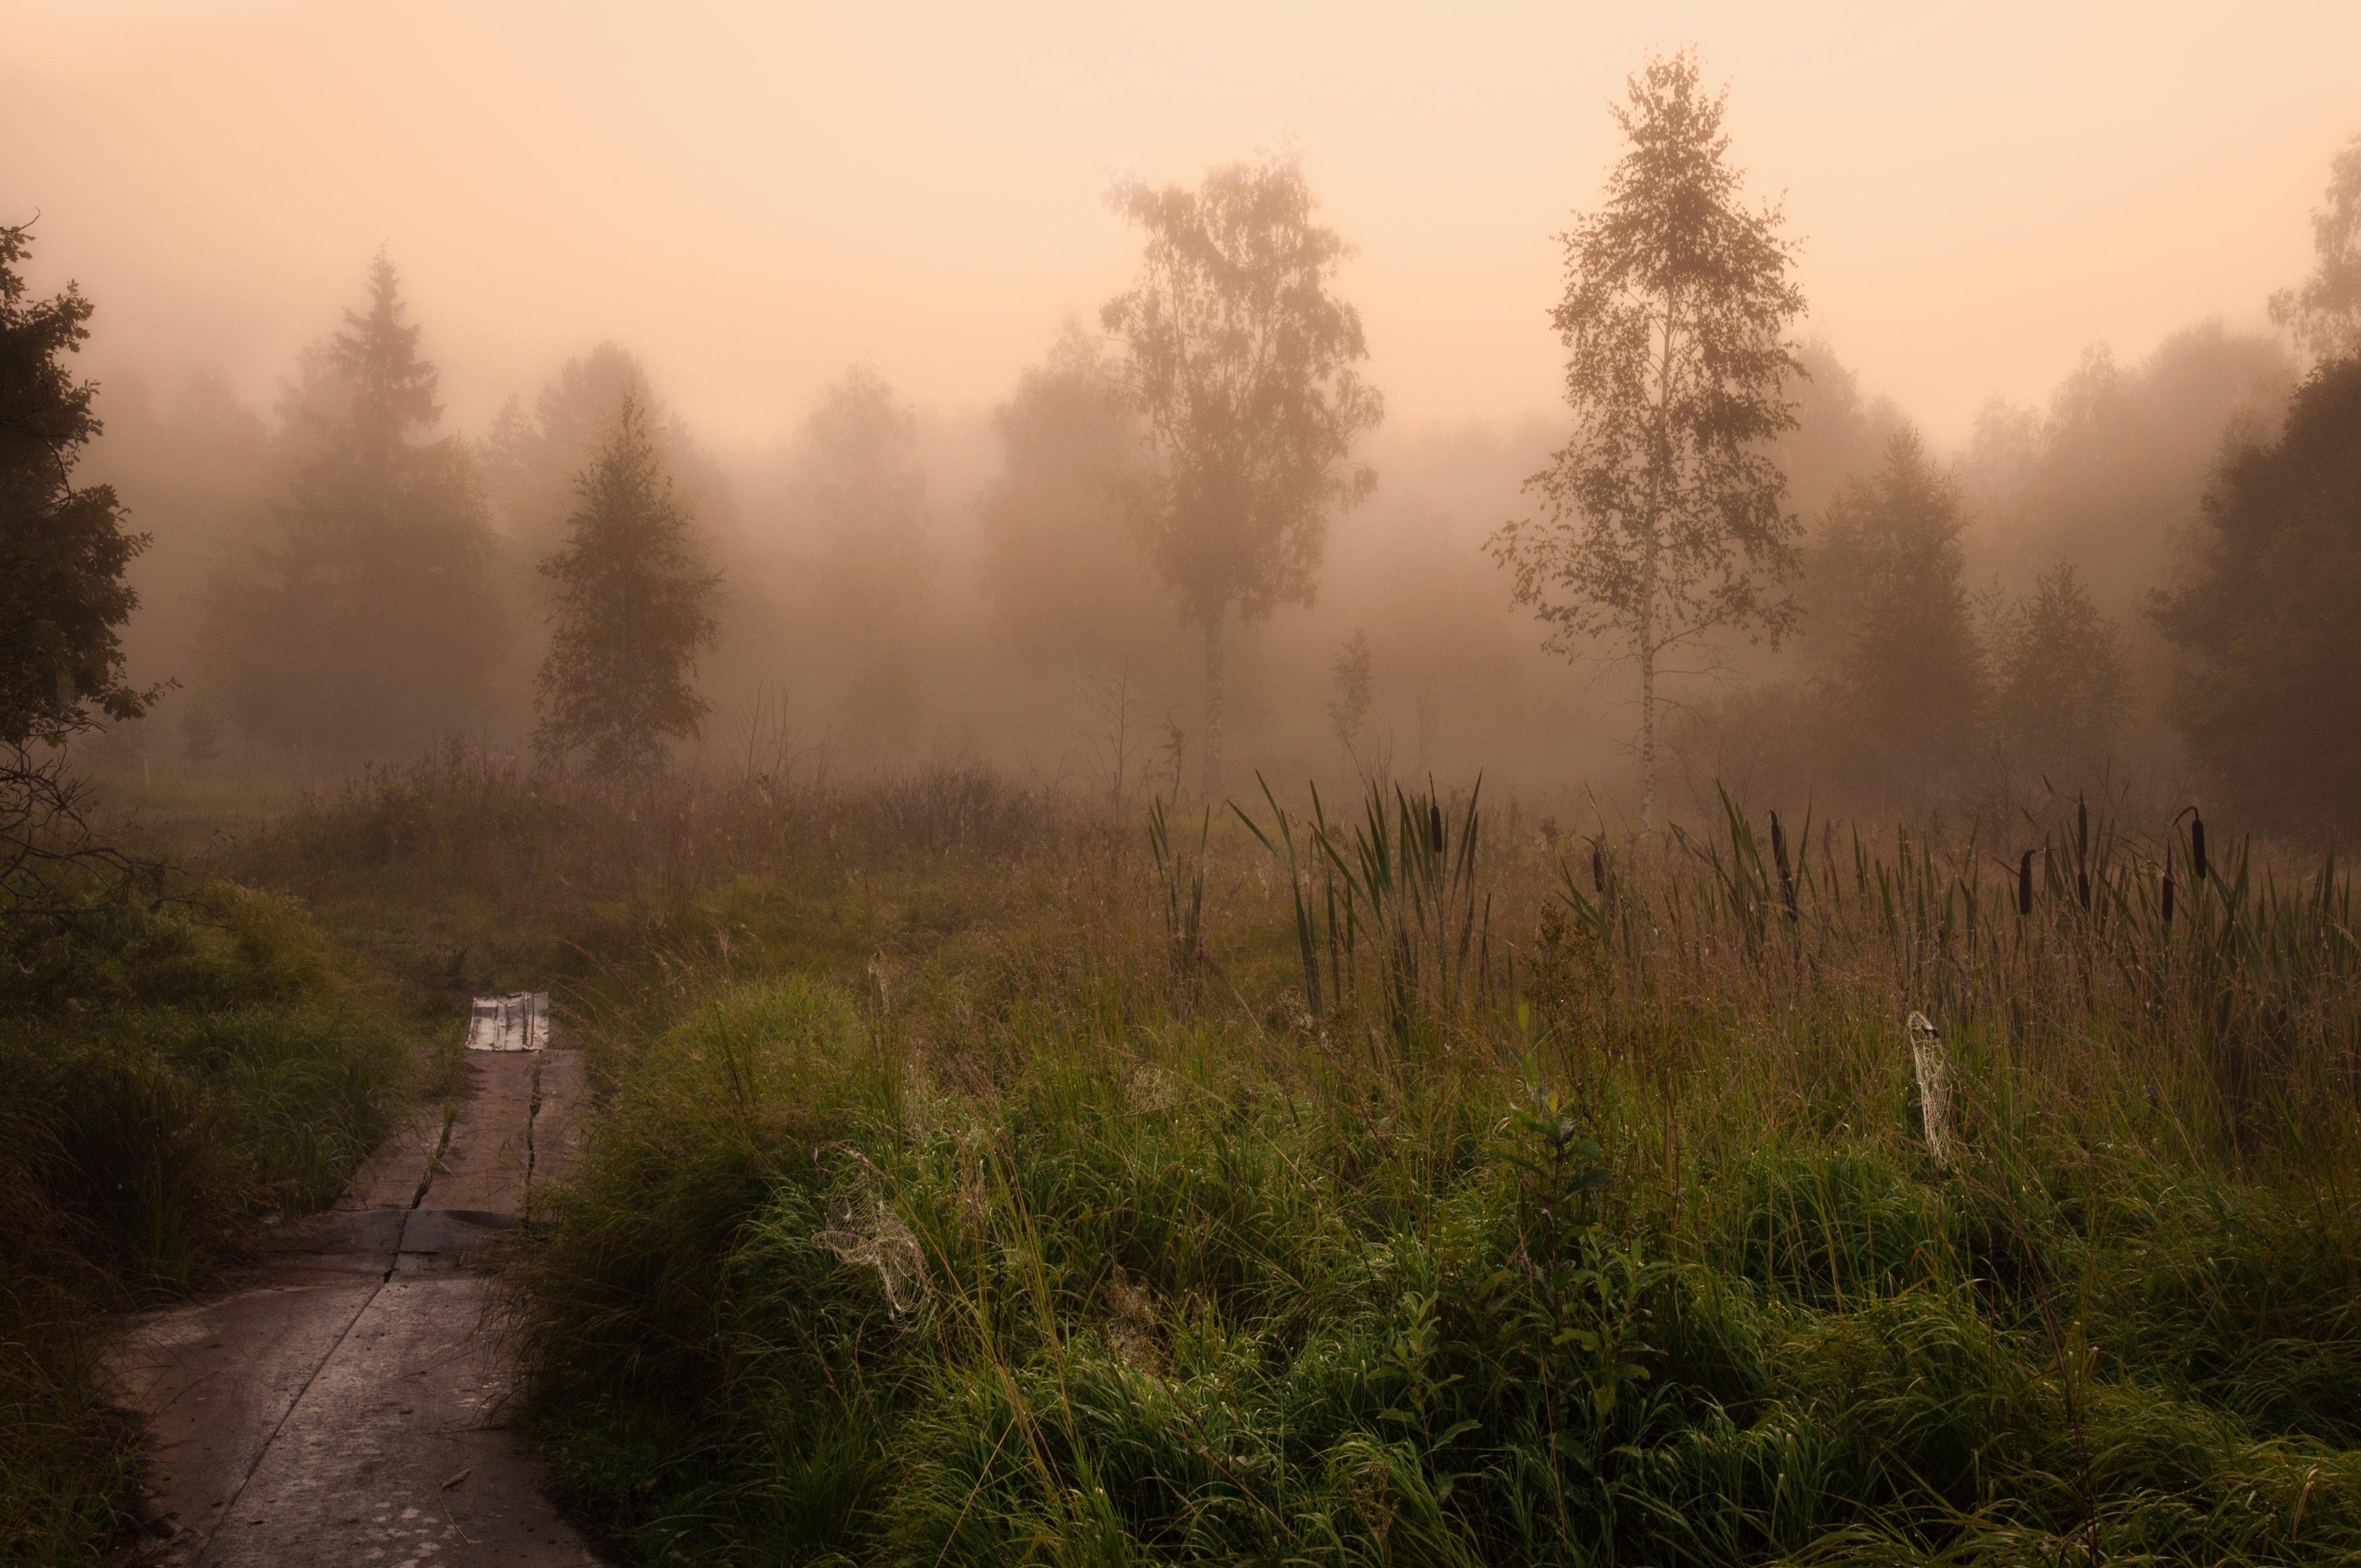 утро, рассвет, природа, пейзаж, туман, осень, Алексей Сергованцев